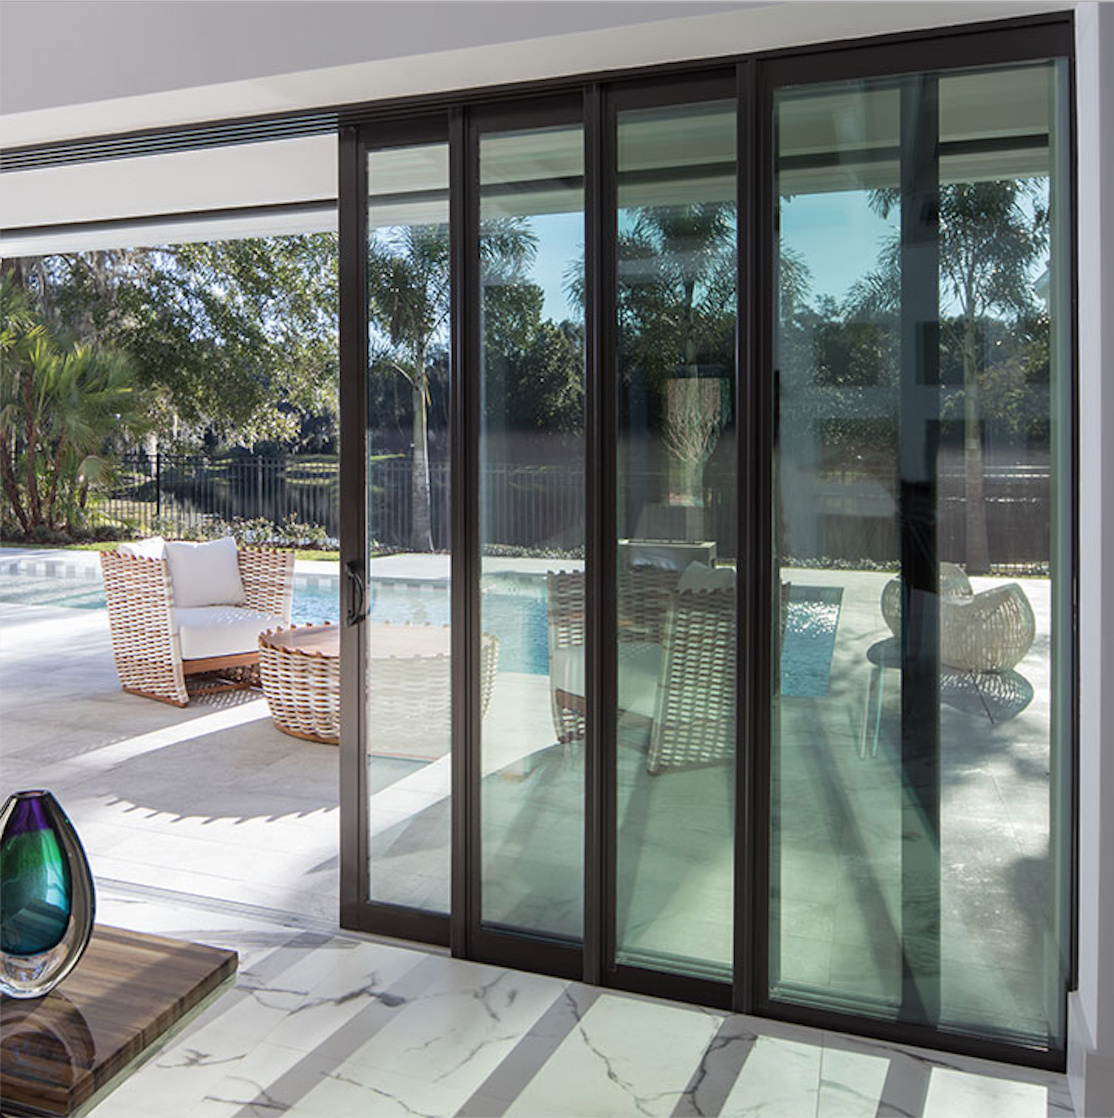 4780 4880 Pocket Sliding Patio Doors Ply Gem Patio Doors Sliding Patio Doors Exterior Doors With Glass